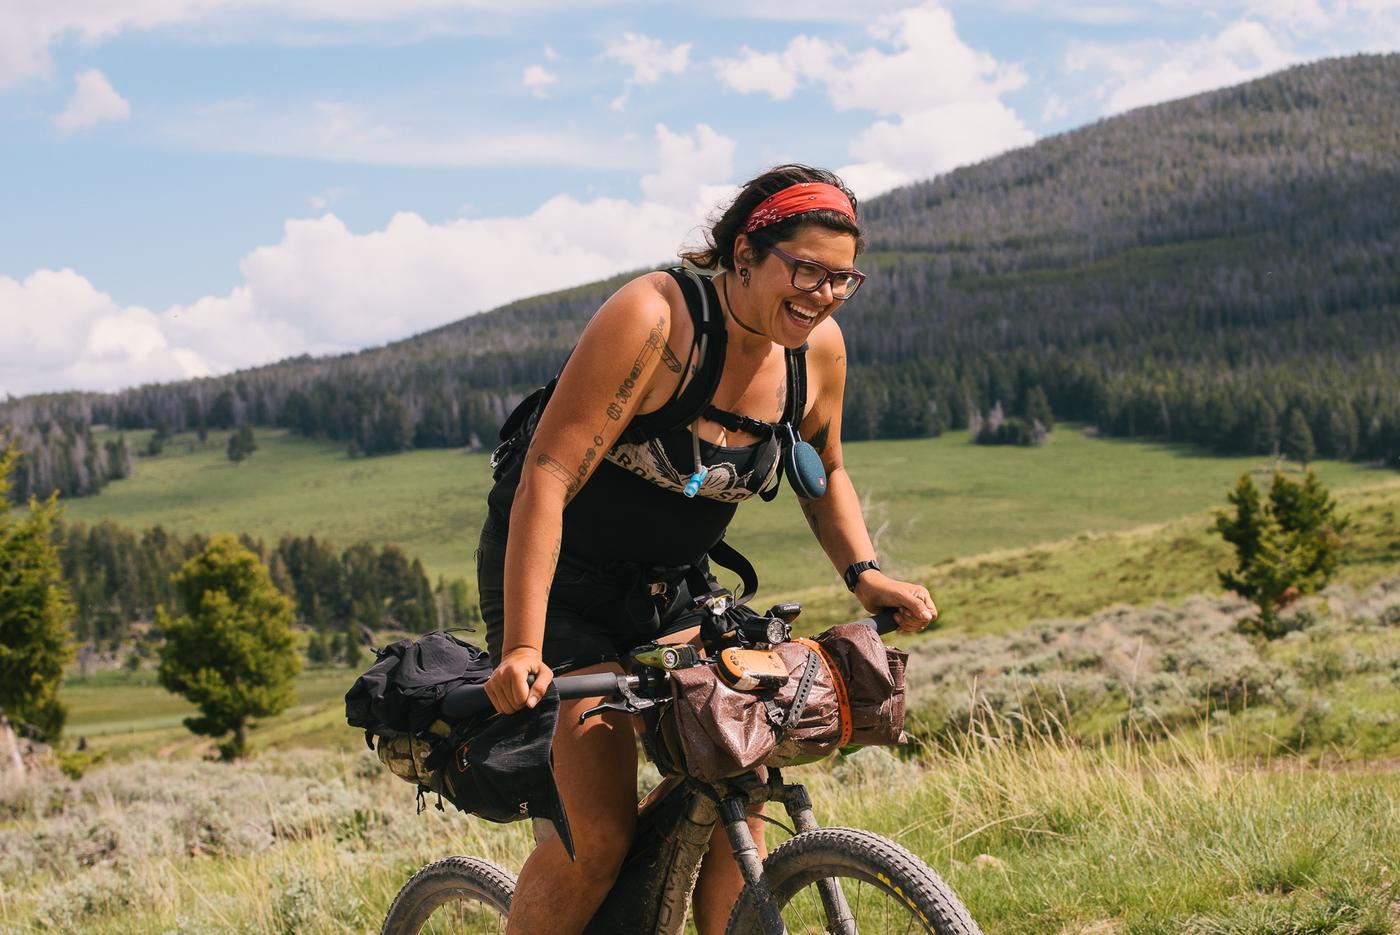 Ogichidaakwe: Alexandera Houchin's Reflections on Her Tour Divide Race